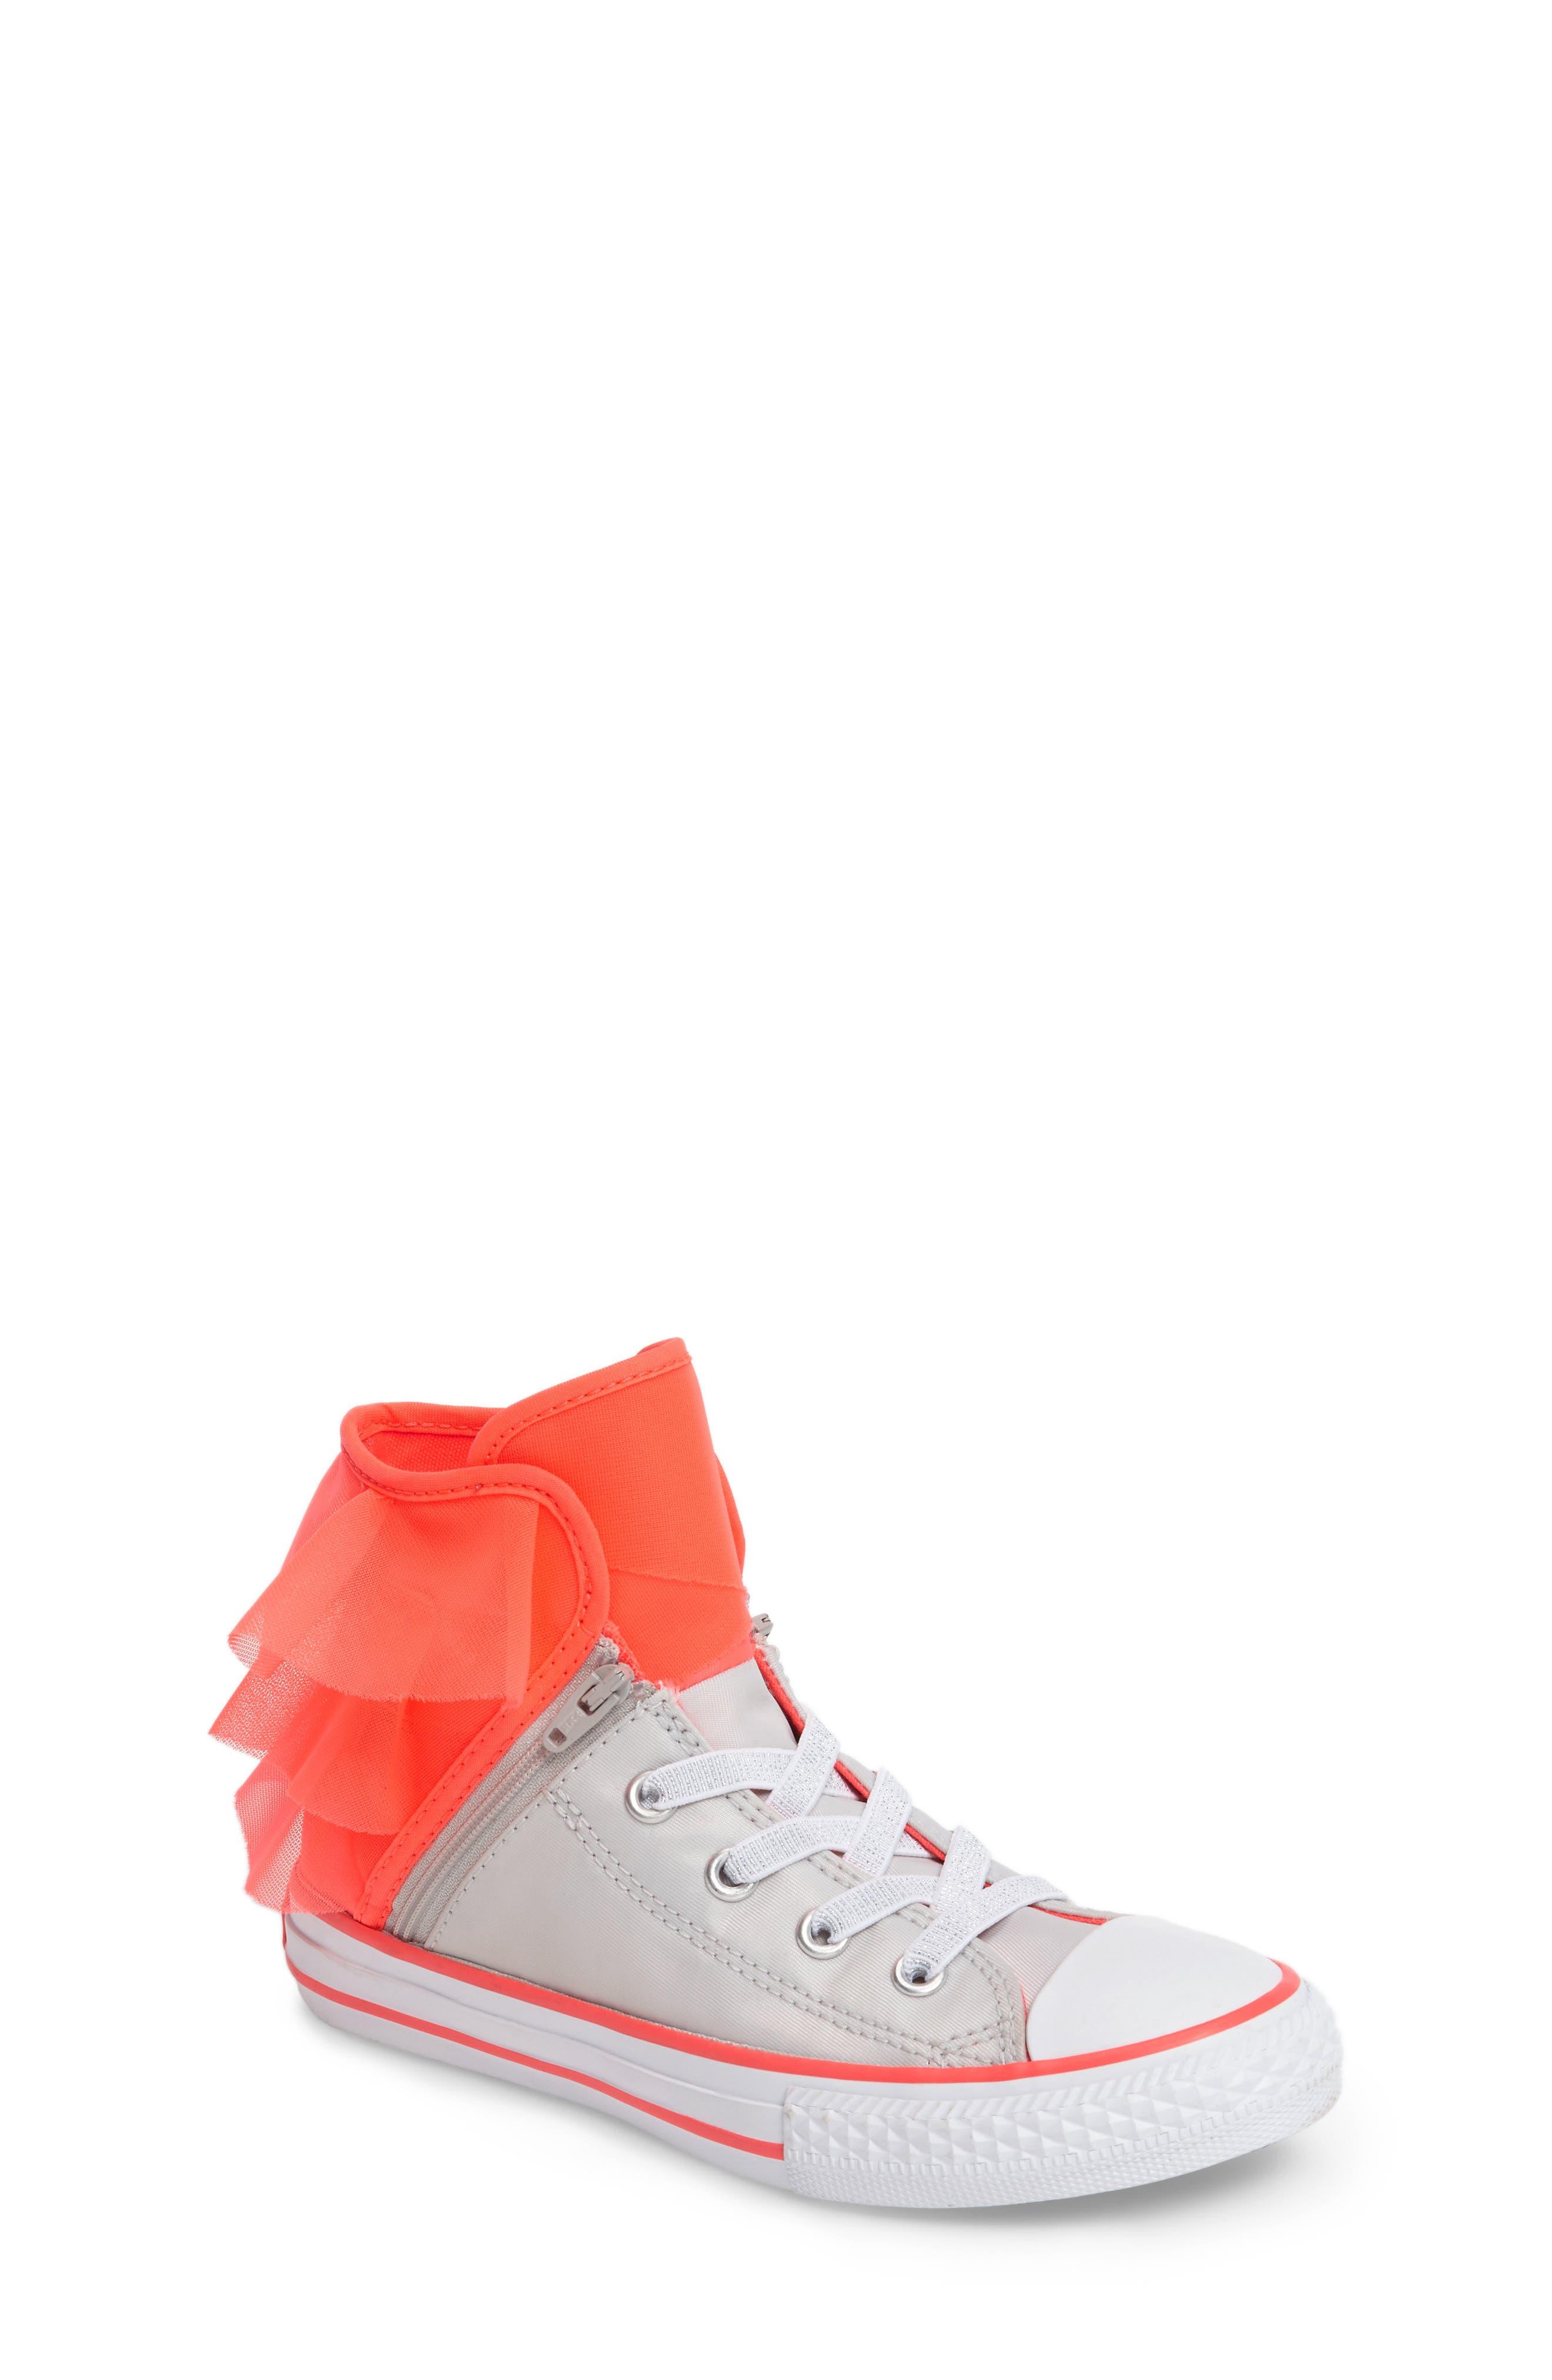 Alternate Image 1 Selected - Converse Block Party High Top Sneaker (Baby, Walker, Toddler, Little Kid & Big Kid)